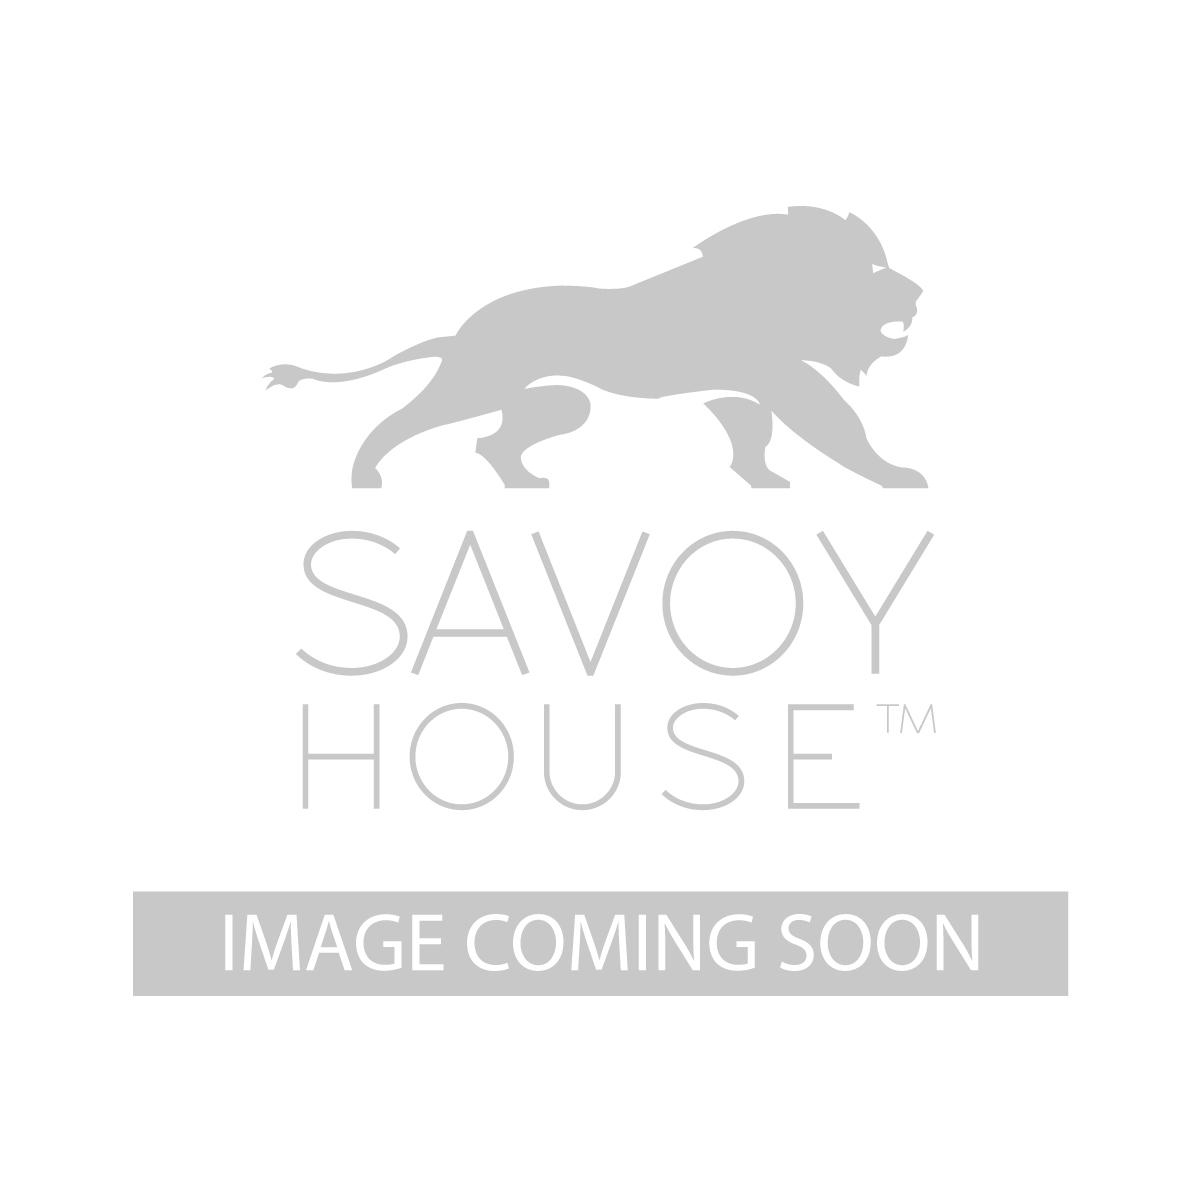 1 489 4 211 captiva 4 light pendant by savoy house captiva 4 light pendant arubaitofo Images